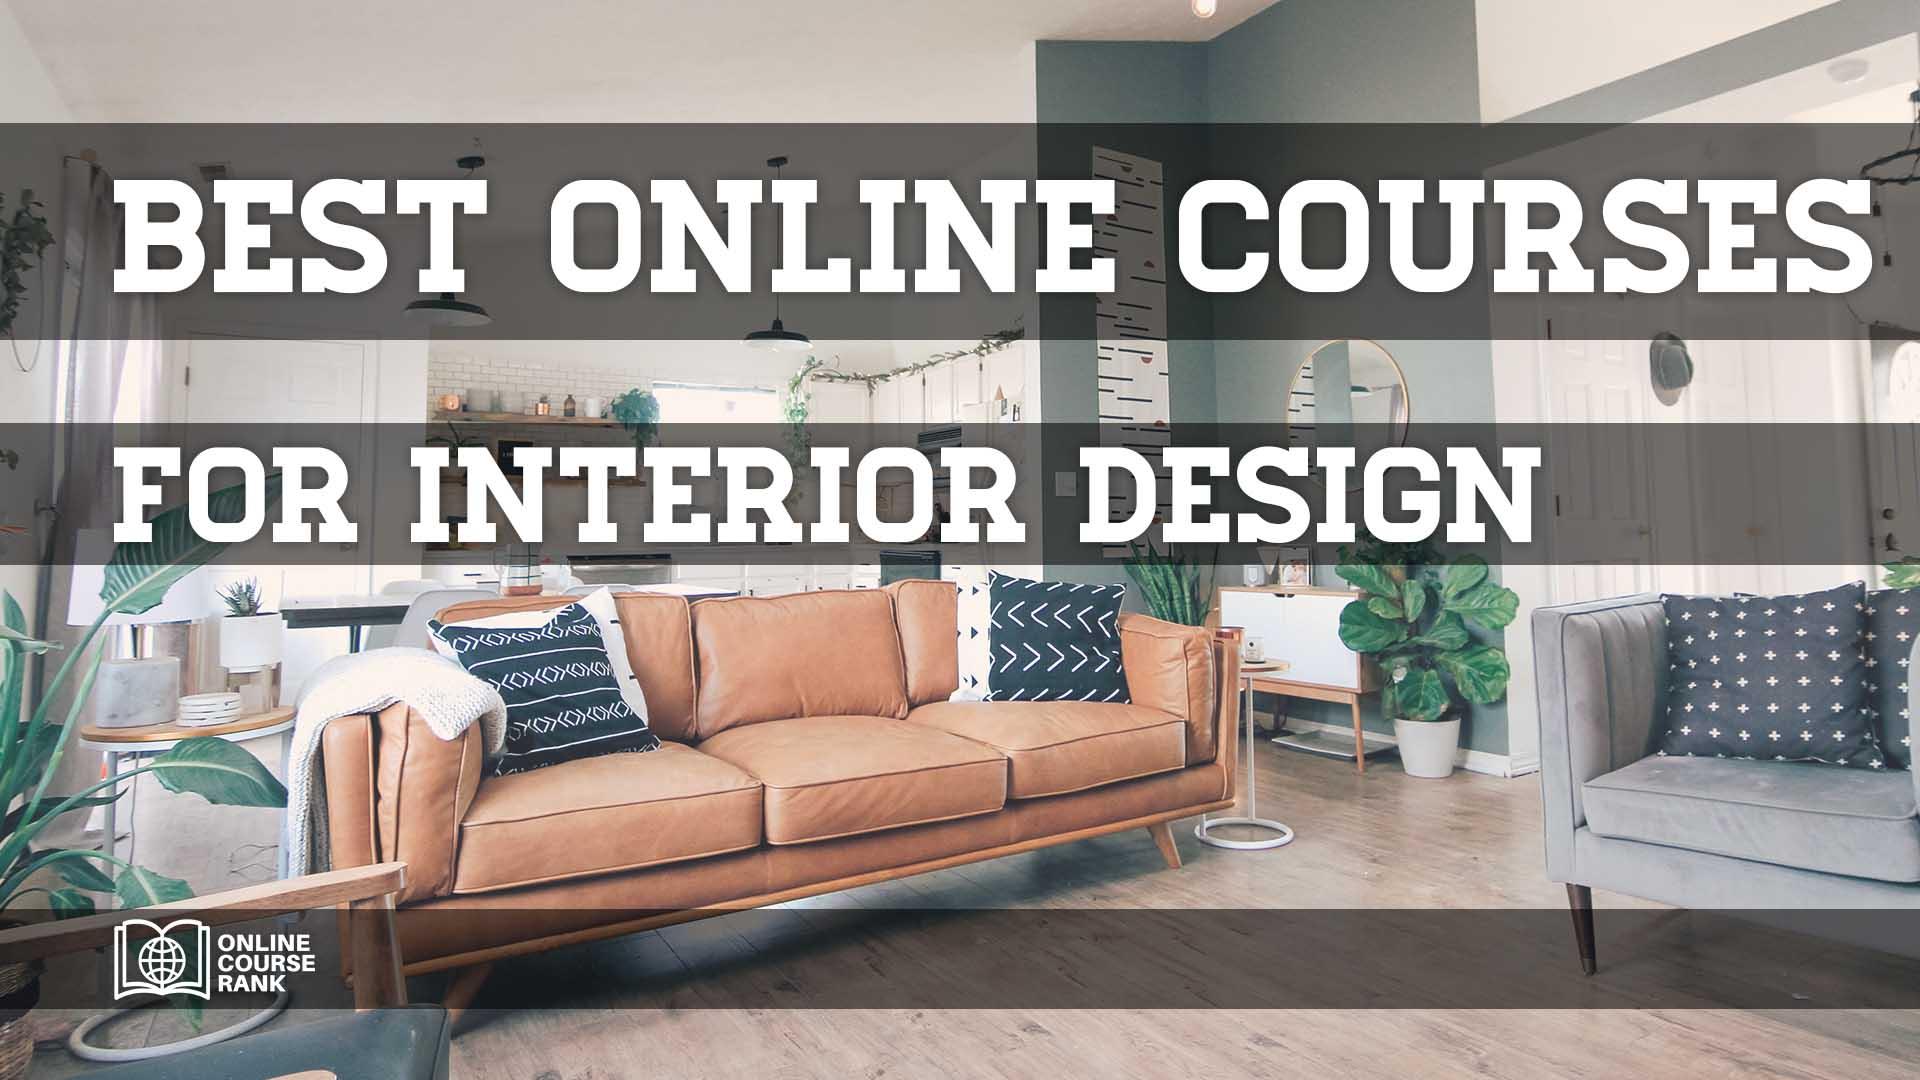 Best Online Interior Design Courses 2020 Guide Onlinecourserank